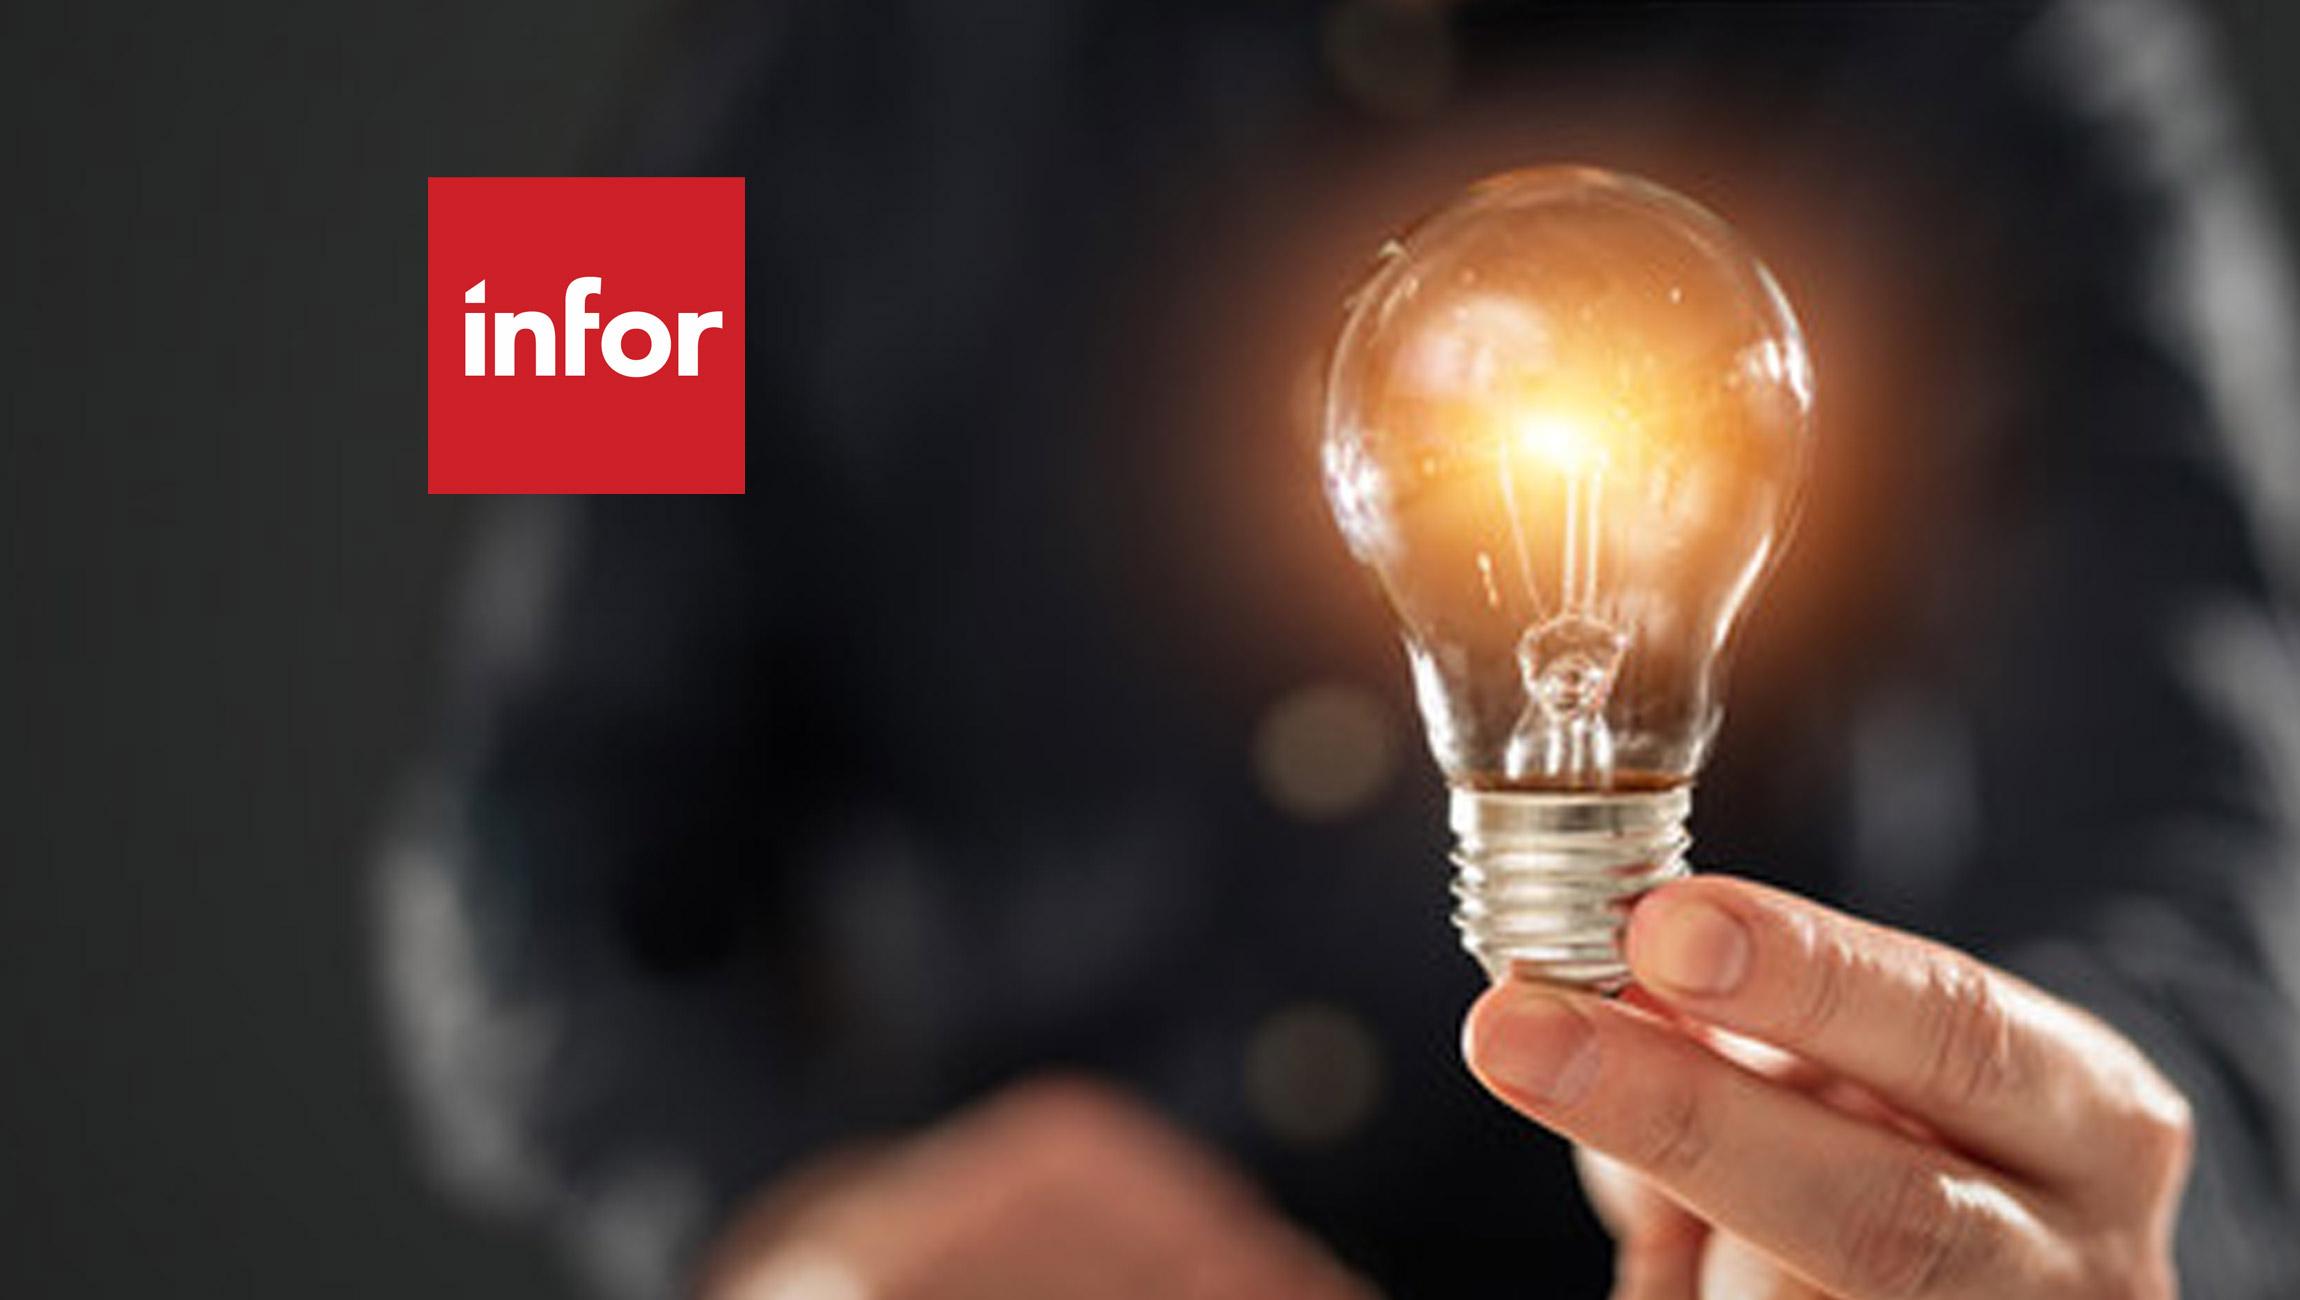 DB Schenker Innovates with Infor